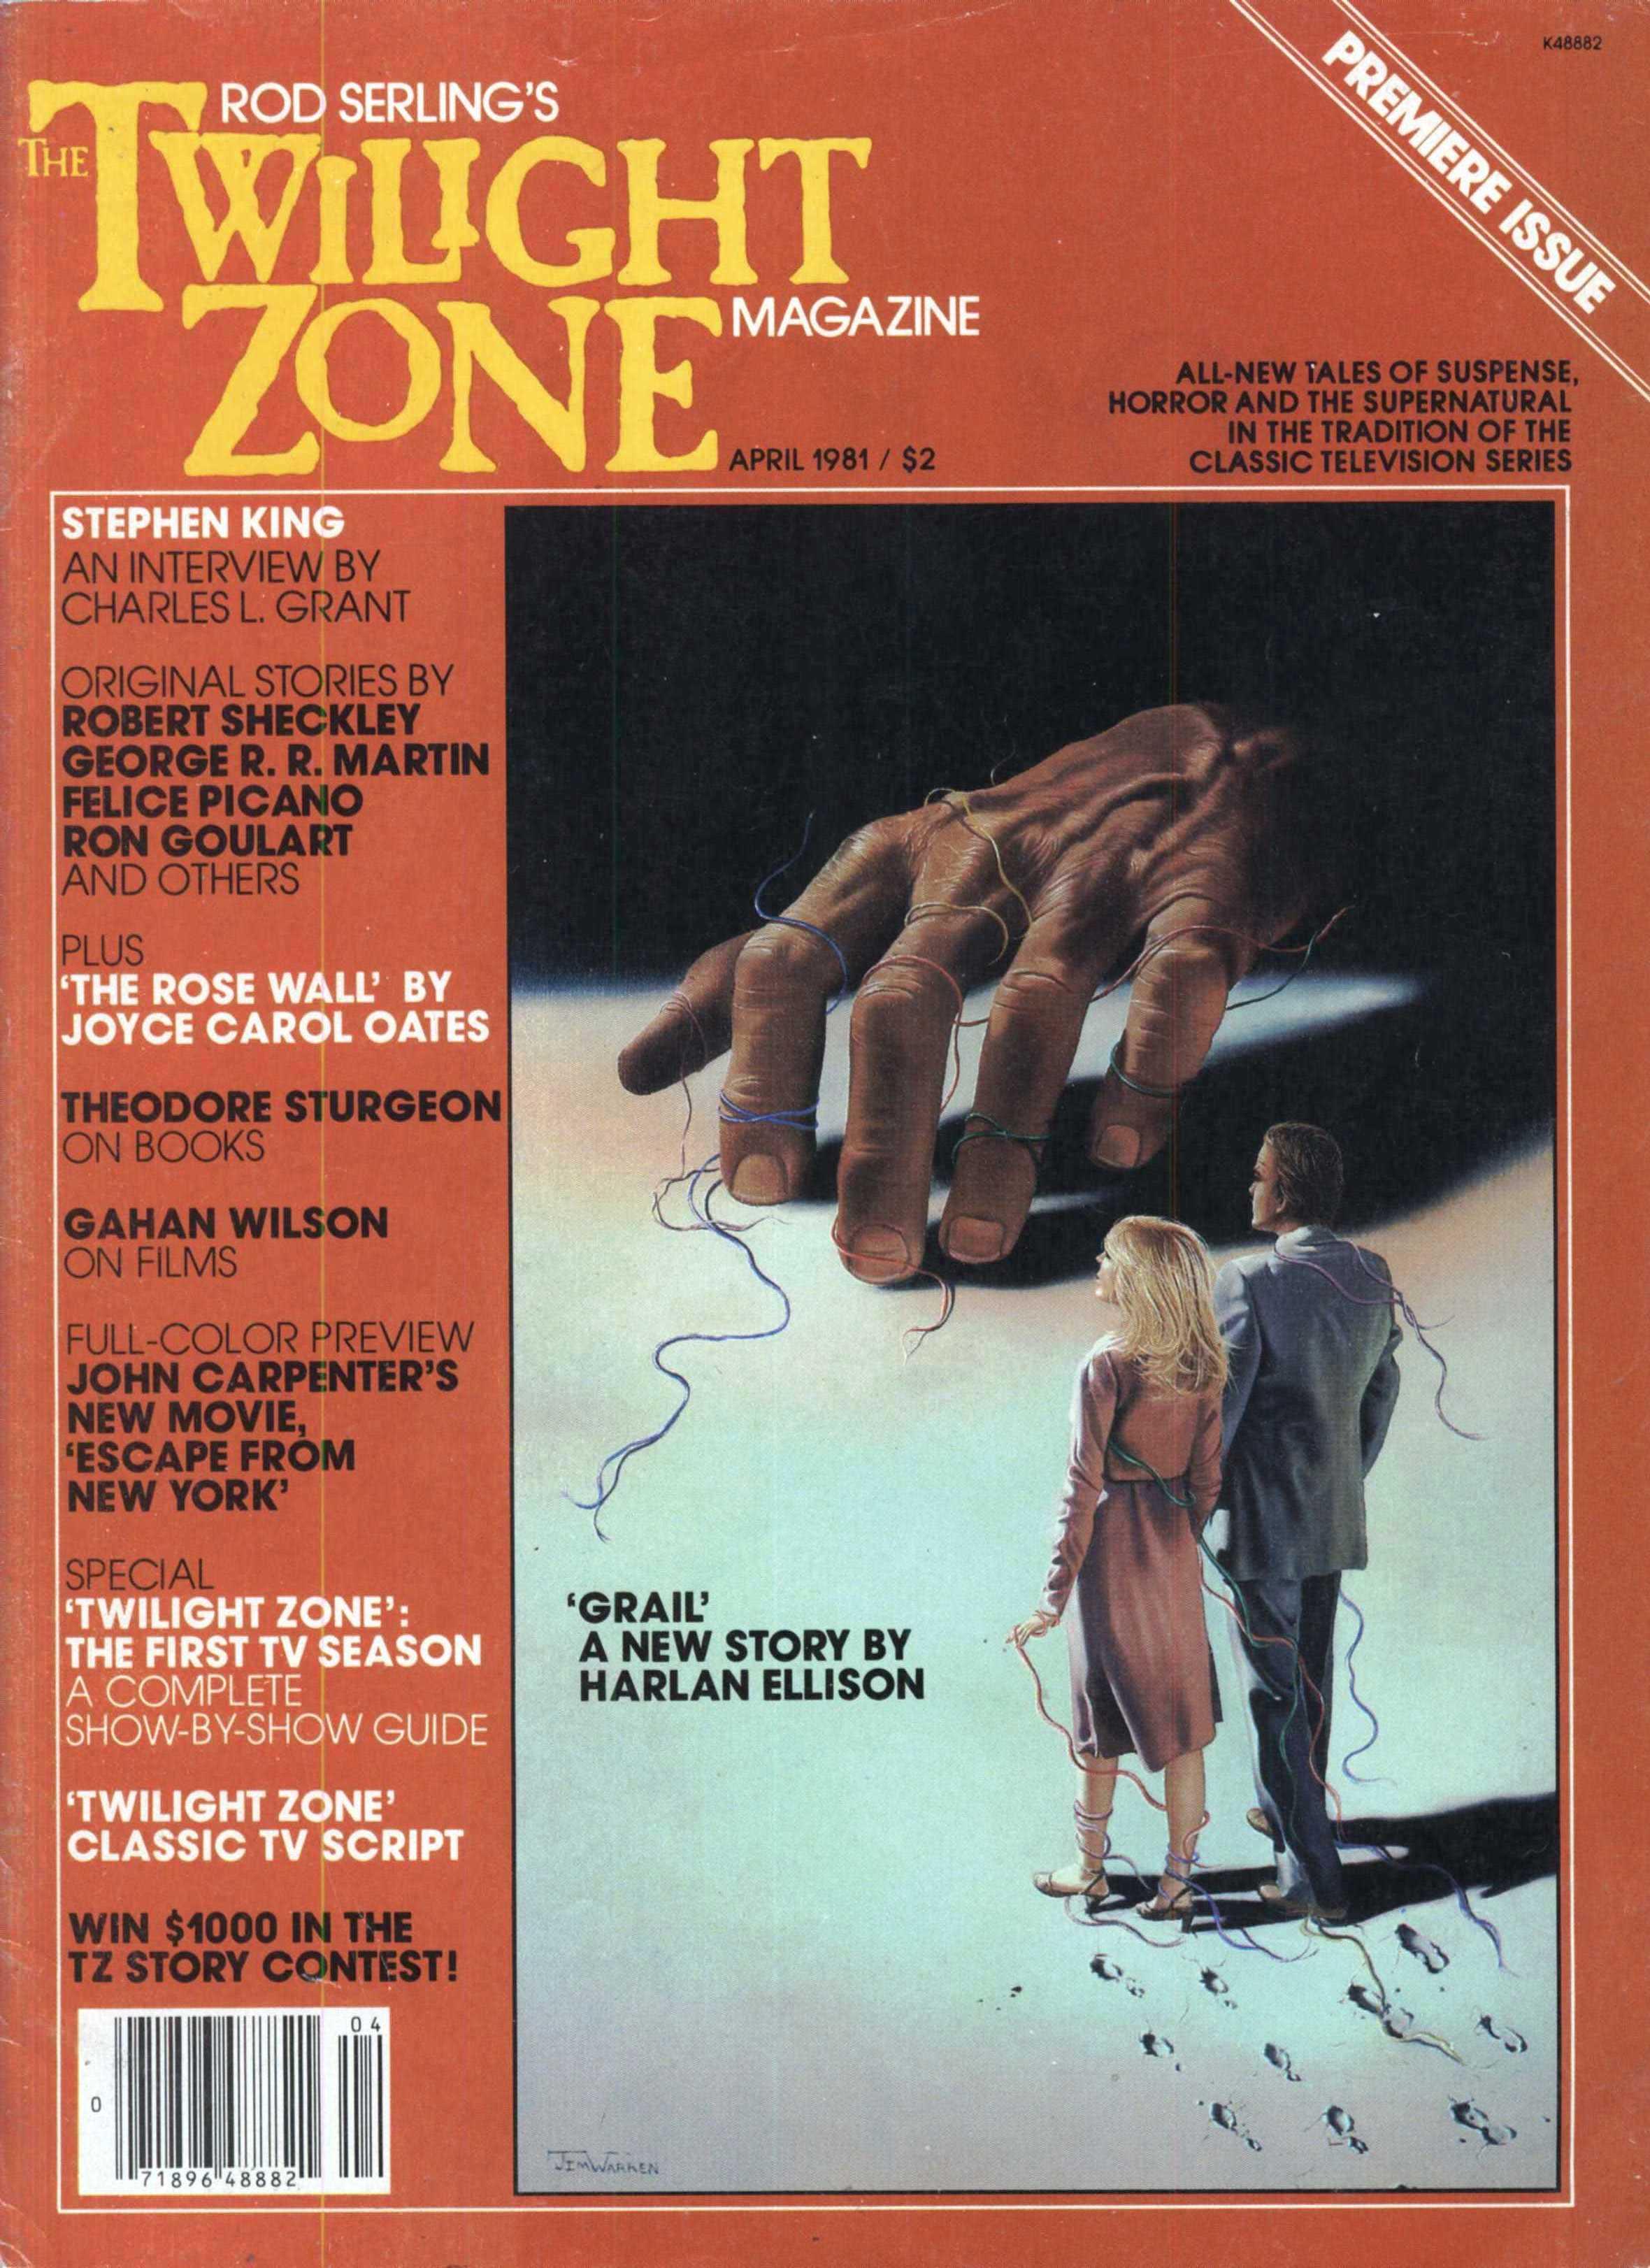 Twilight Zone magazine, April 1981